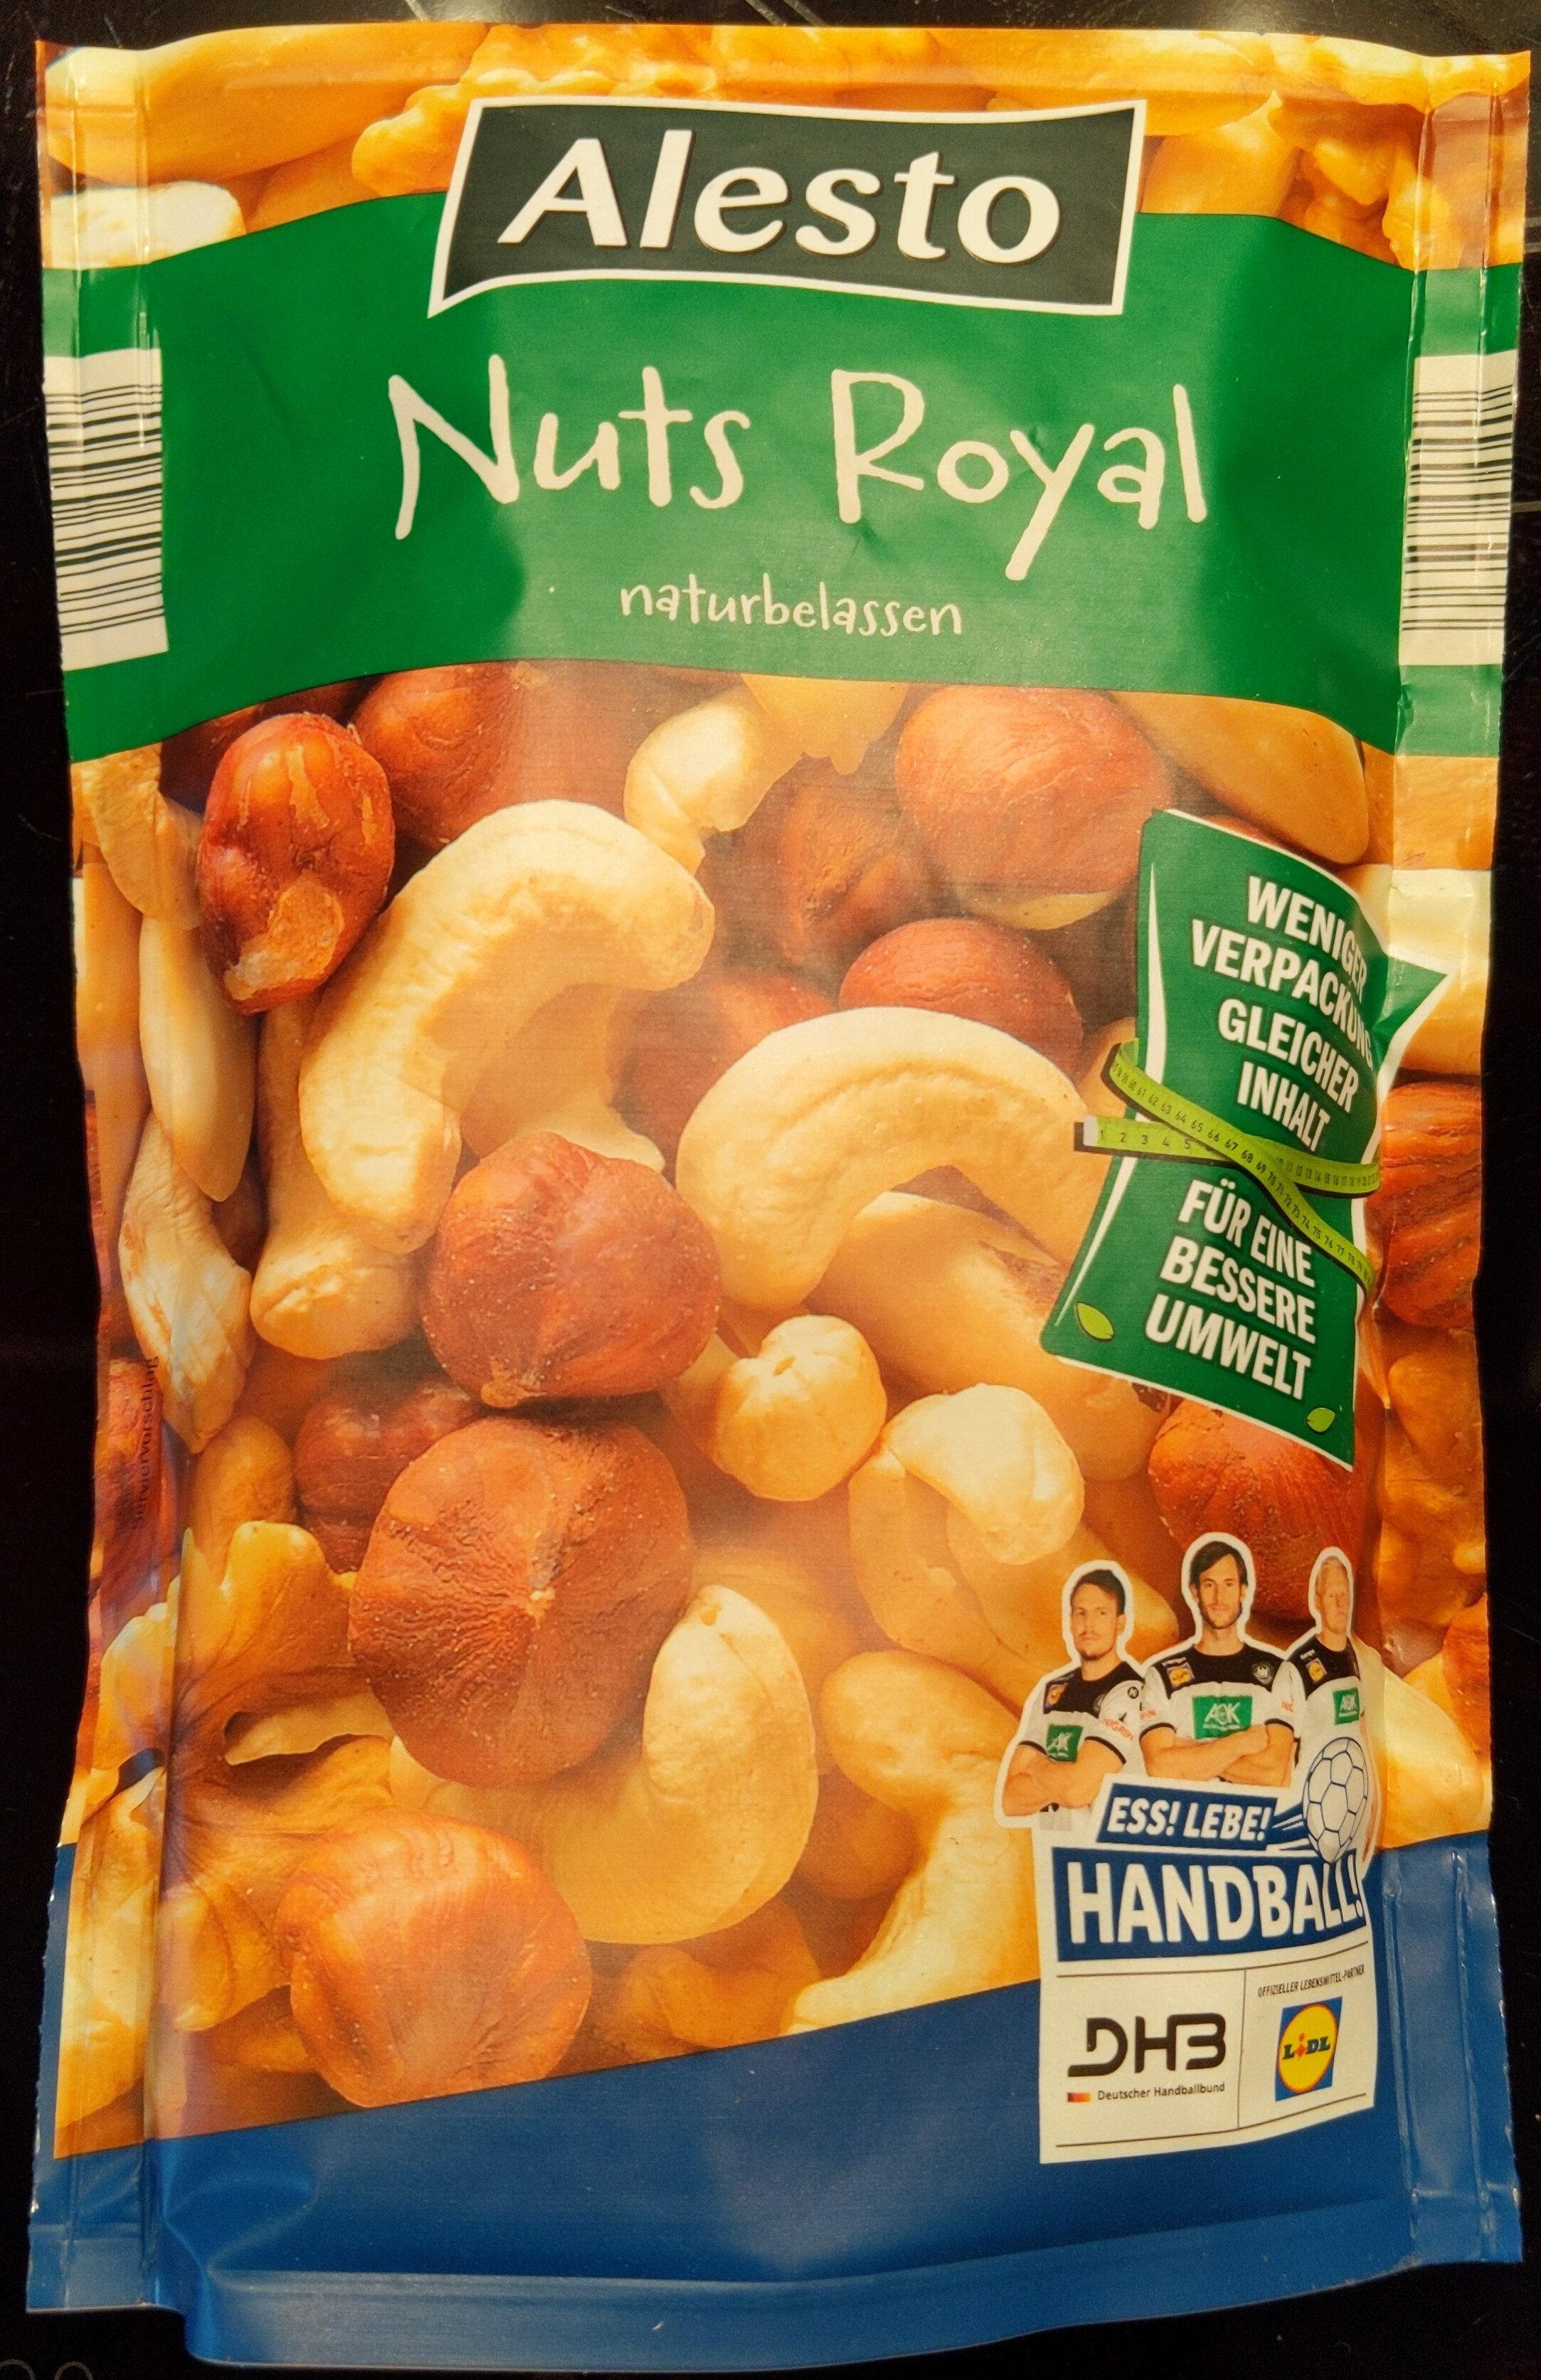 Nuts Royal naturbelassen - Product - en